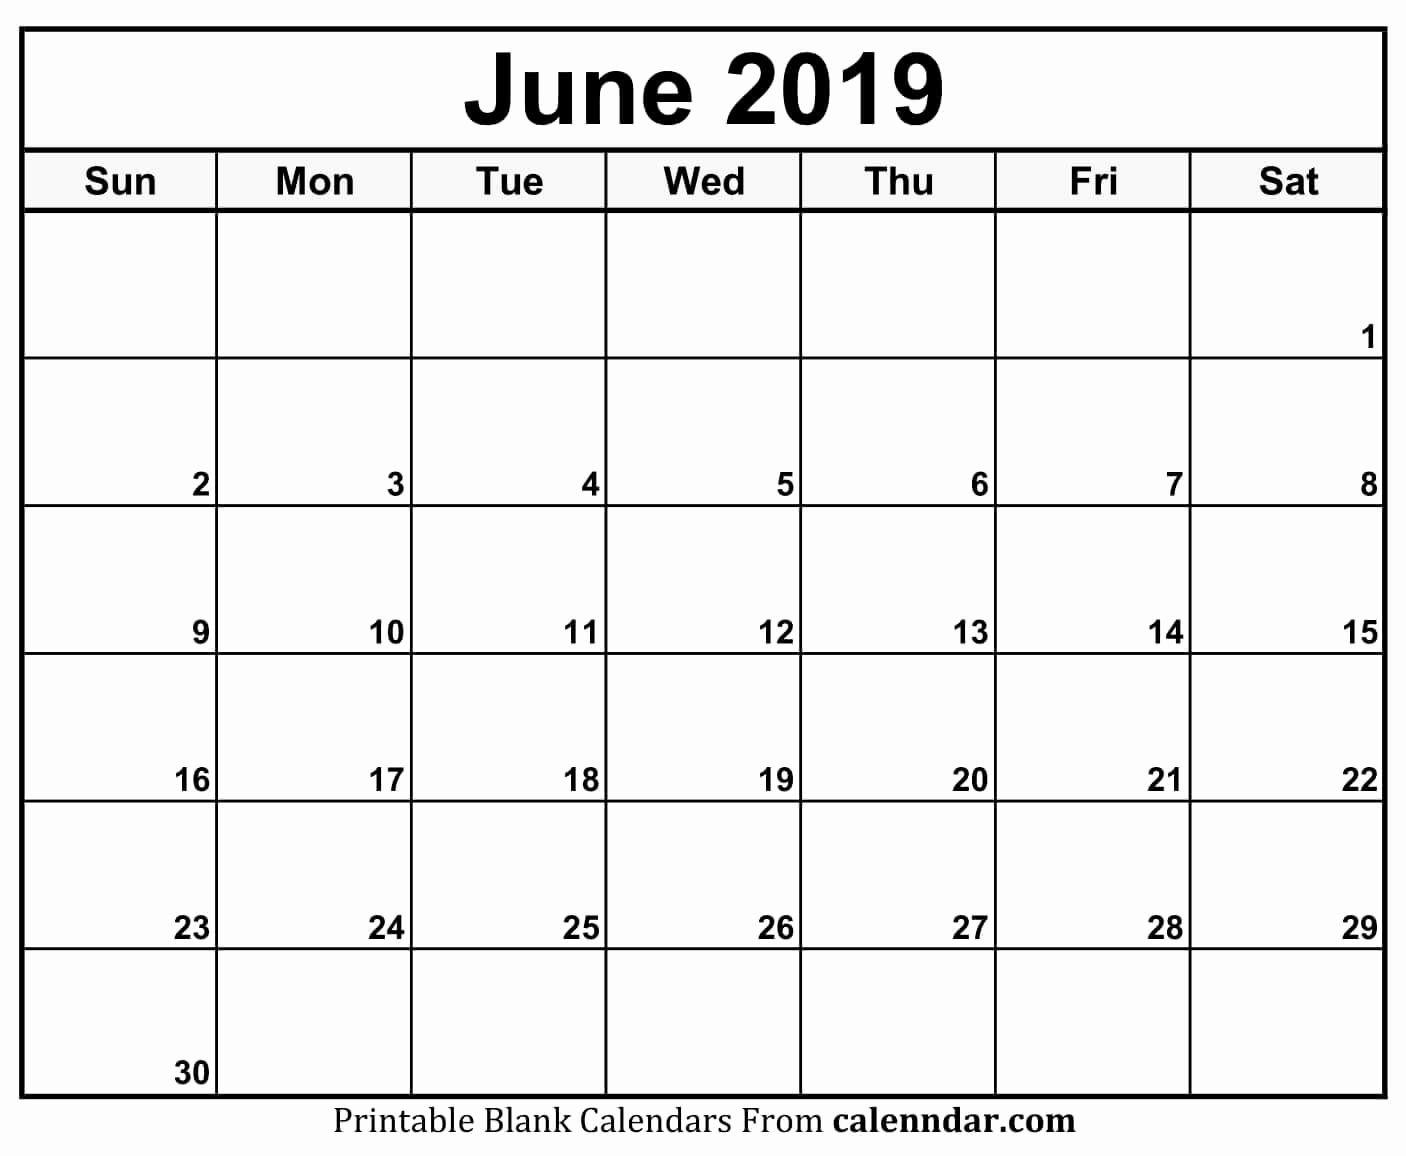 Unique 49 Examples Printable Daily Calendar June 2019 June 2019